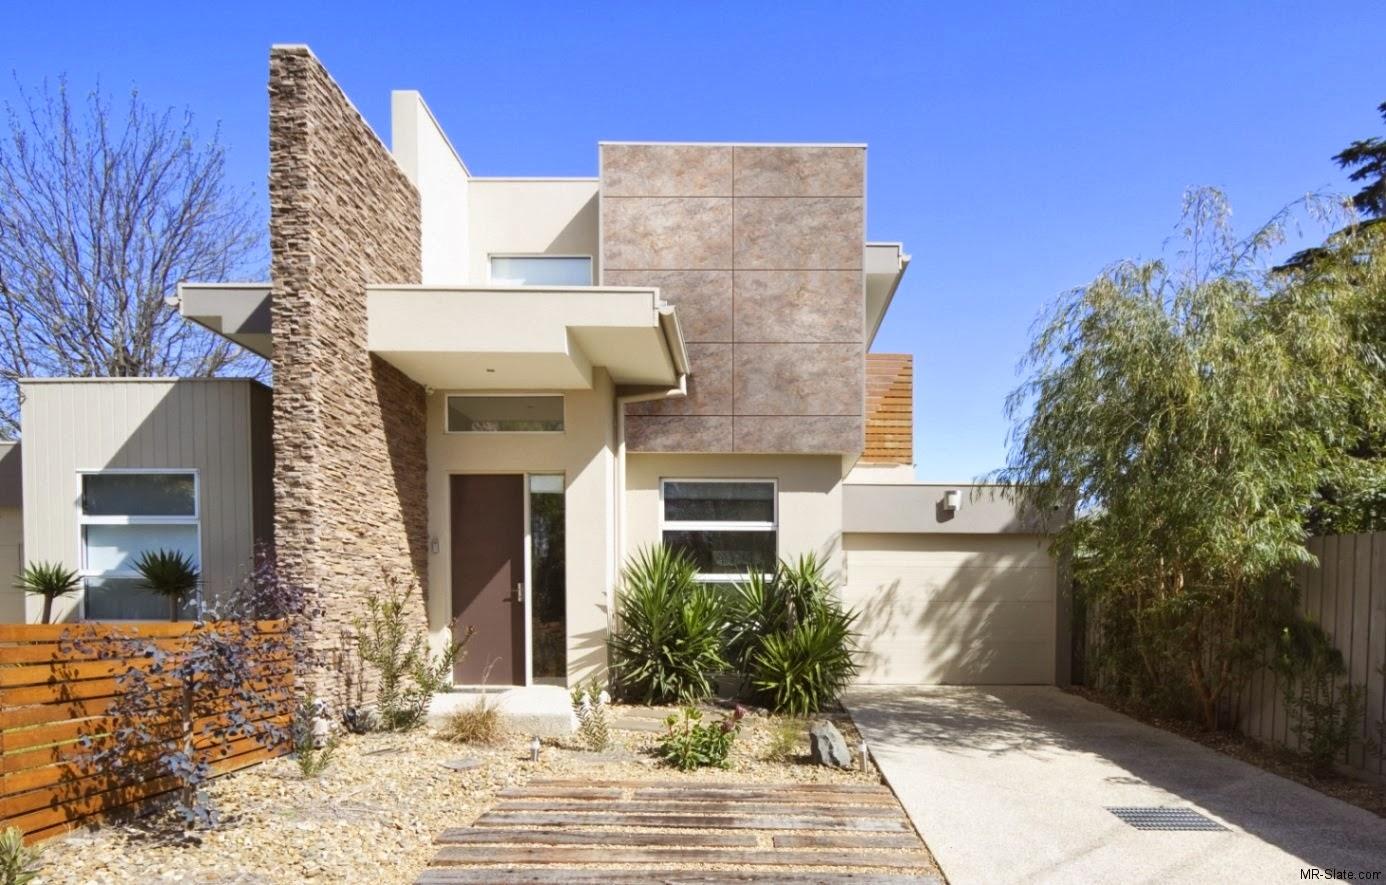 Fachadas De Casas Pequenas Modernas Con Piedra Novocom top